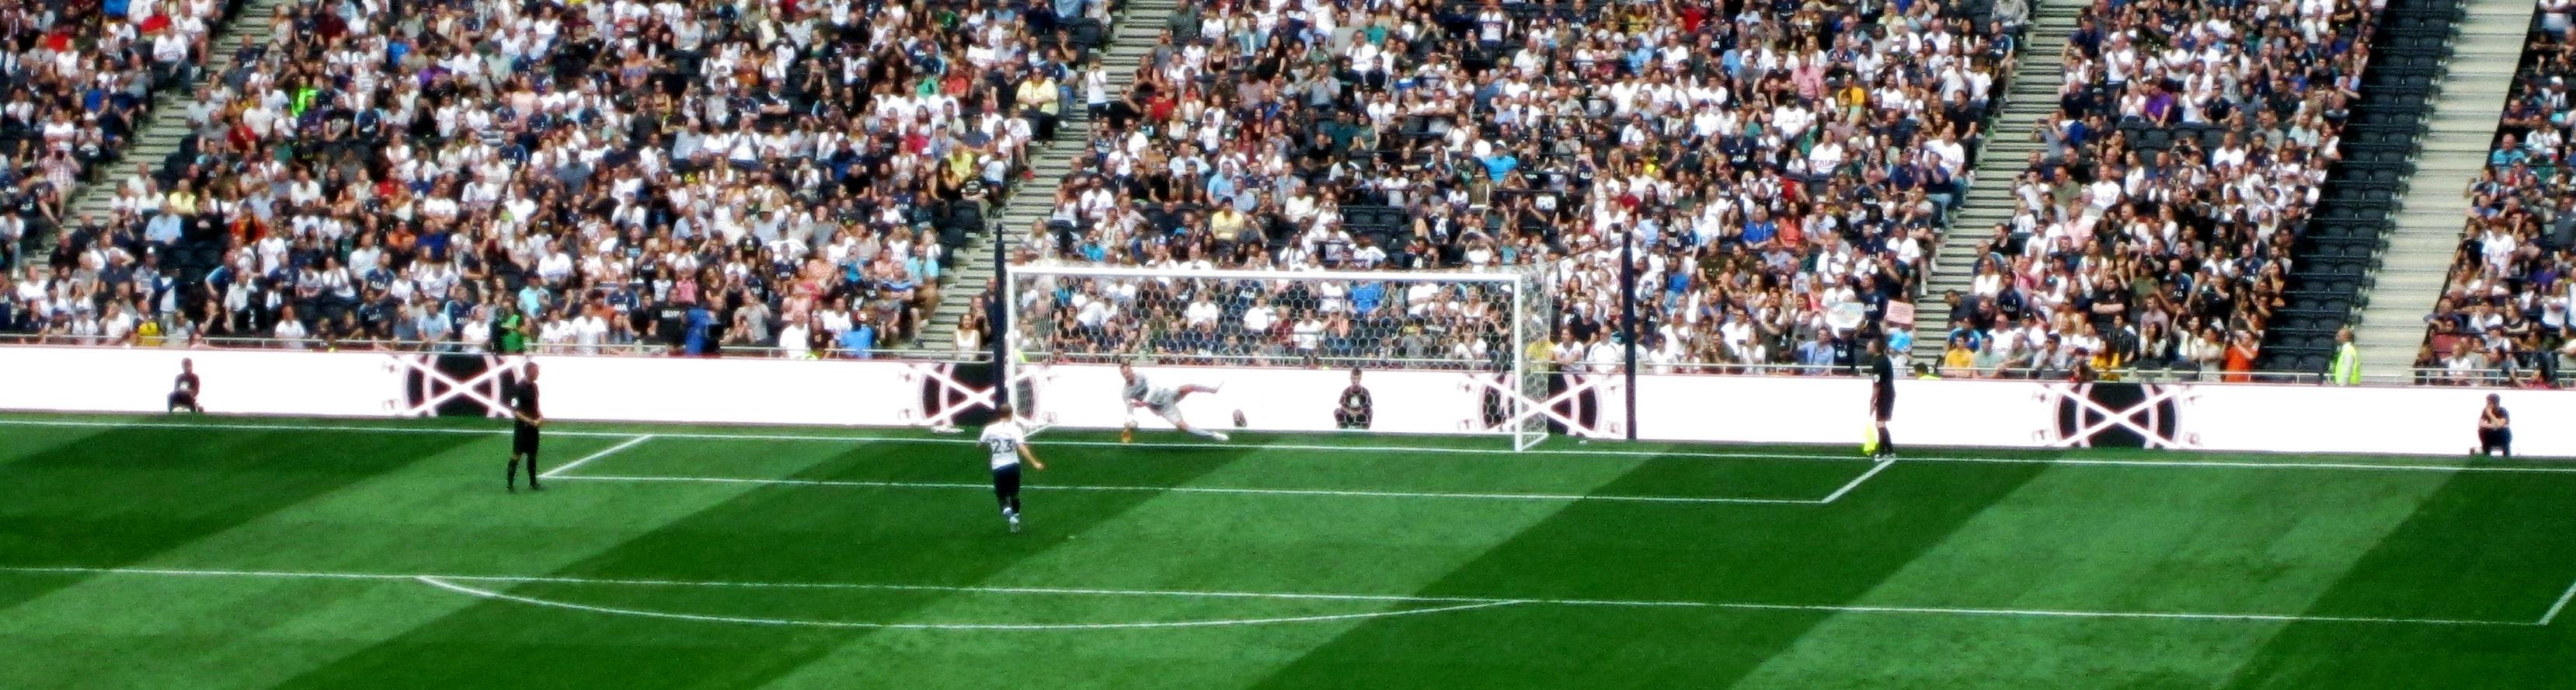 Christian Eriksen takes a penalty for Tottenham Hotspur